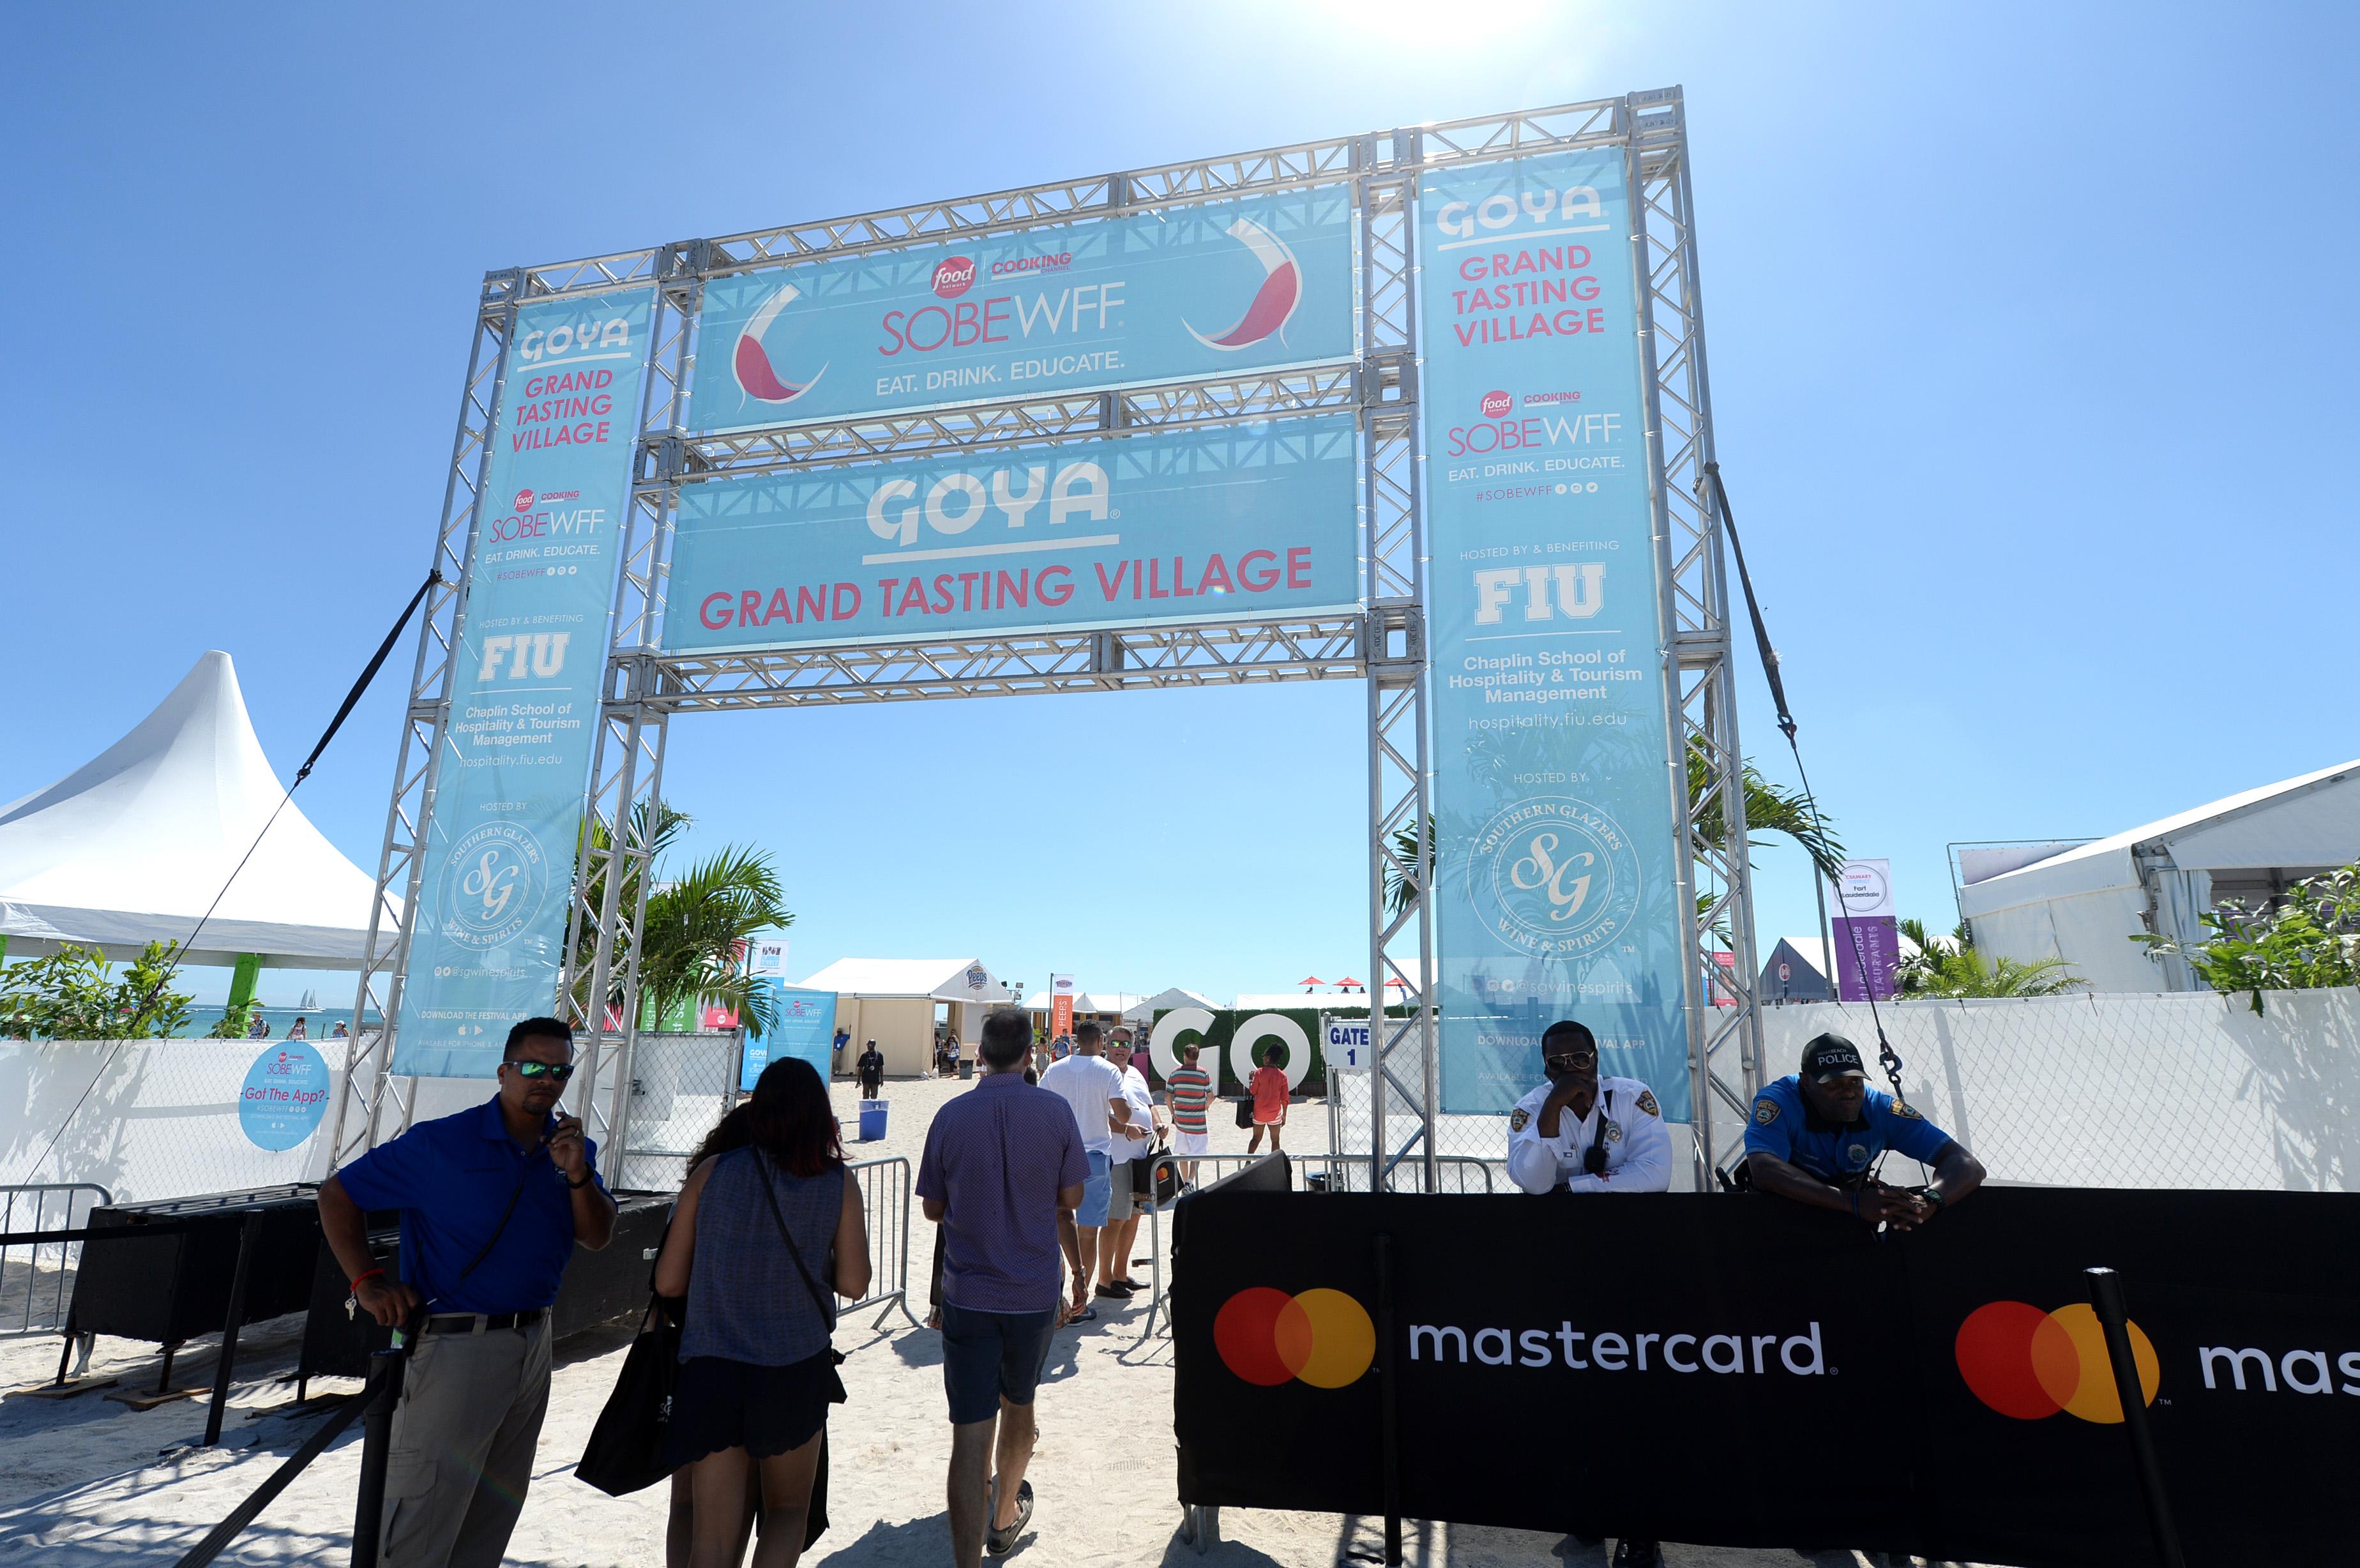 Goya Foods' Grand Tasting Village Featuring Mastercard Grand Tasting Tents & KitchenAid Culinary Demonstrations - Day 1